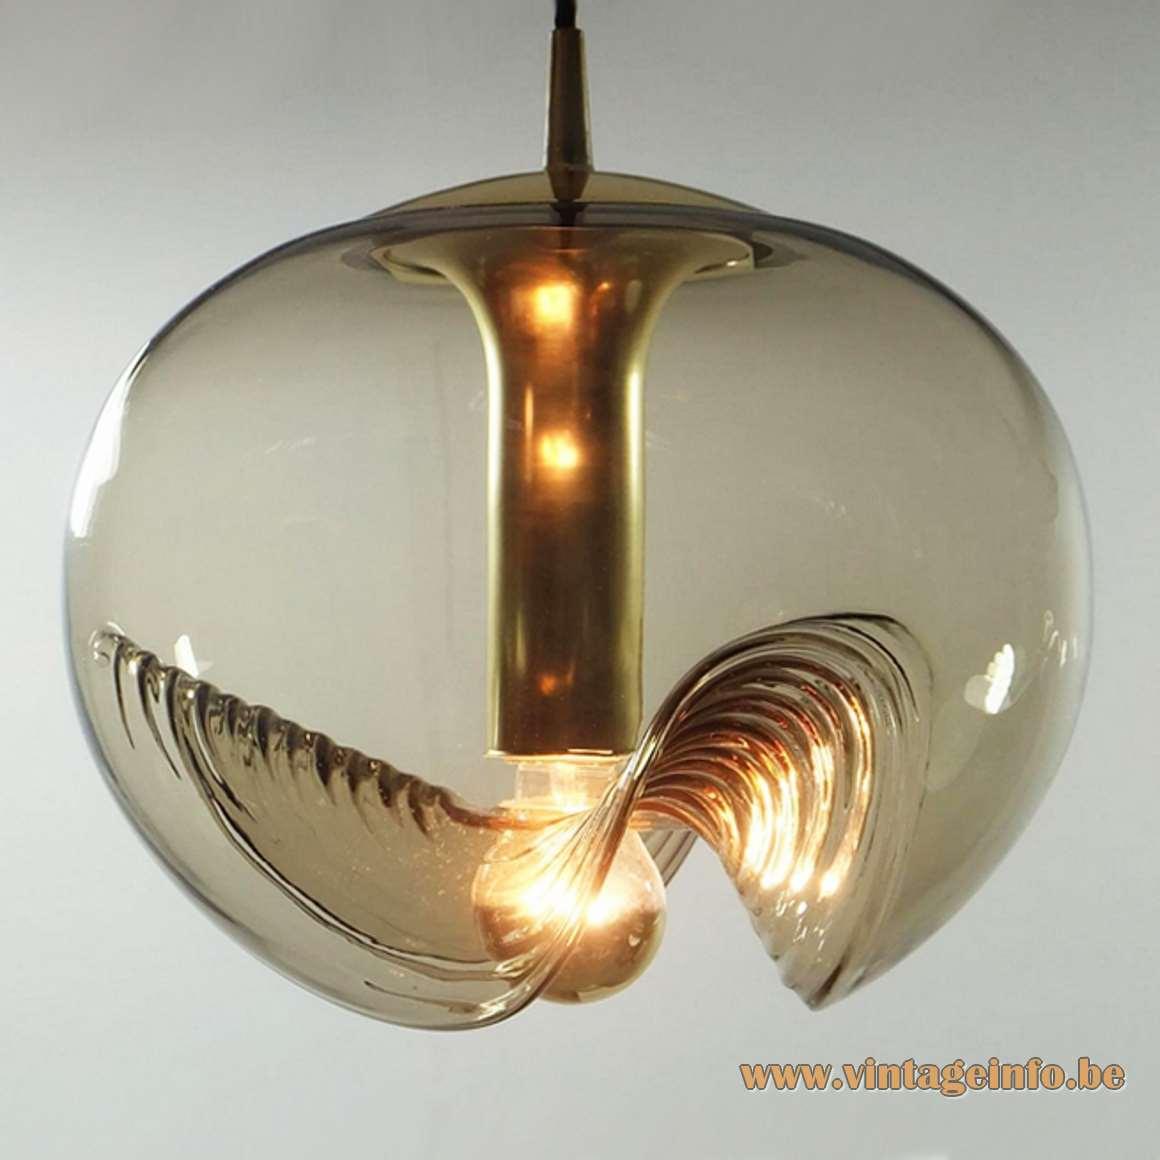 Peill & Putzler Futura Pendant Light - smoked glass